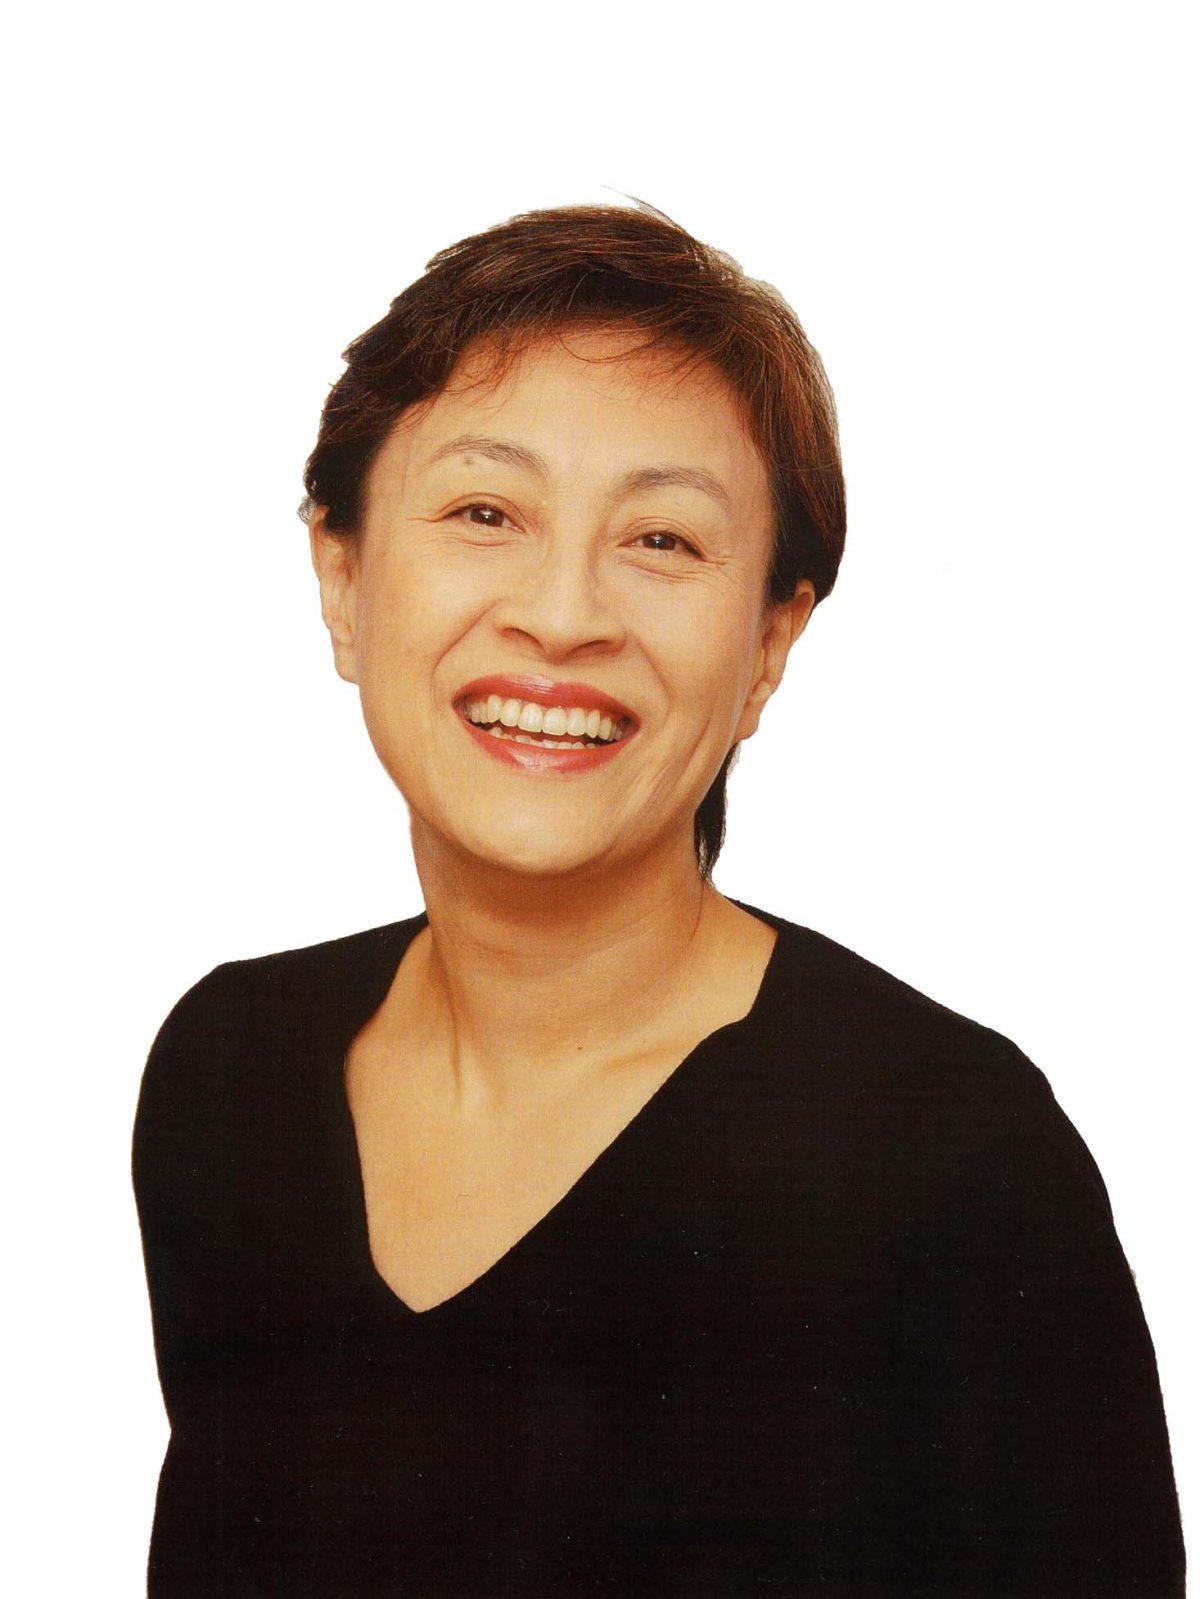 大崎由利子Yuriko Osaki